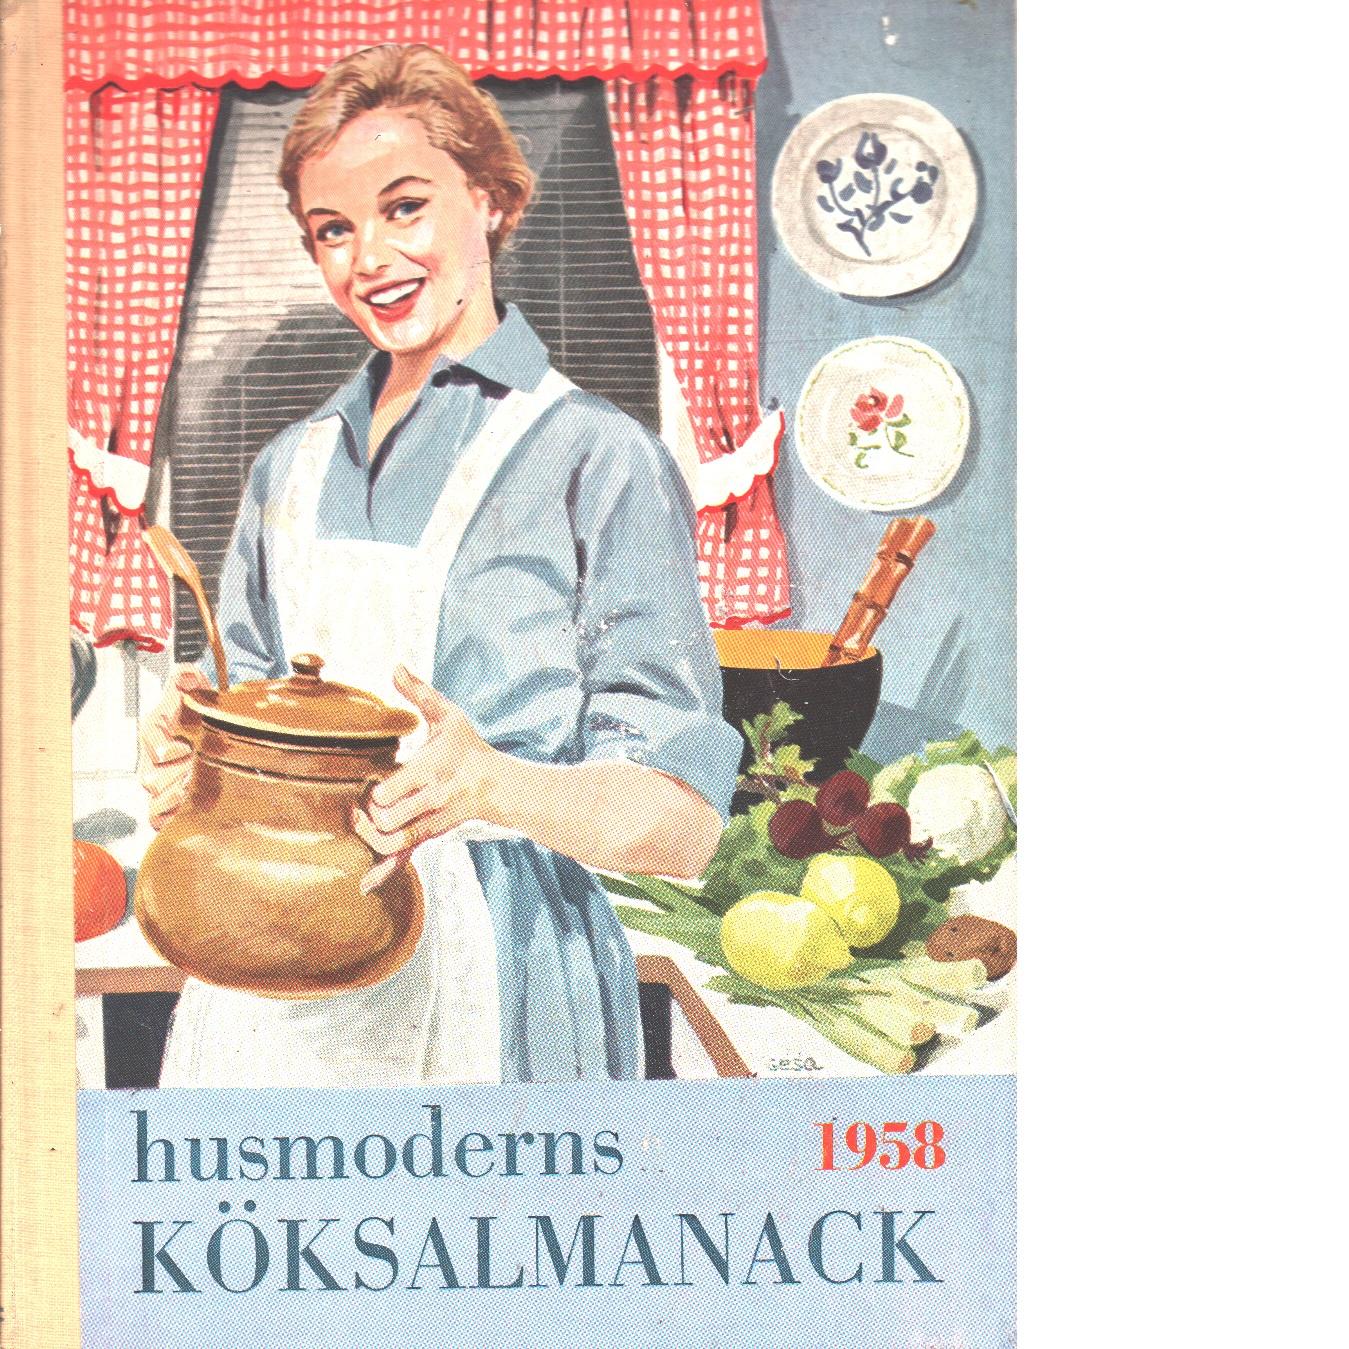 Husmoderns köksalmanack 1958 - Red.